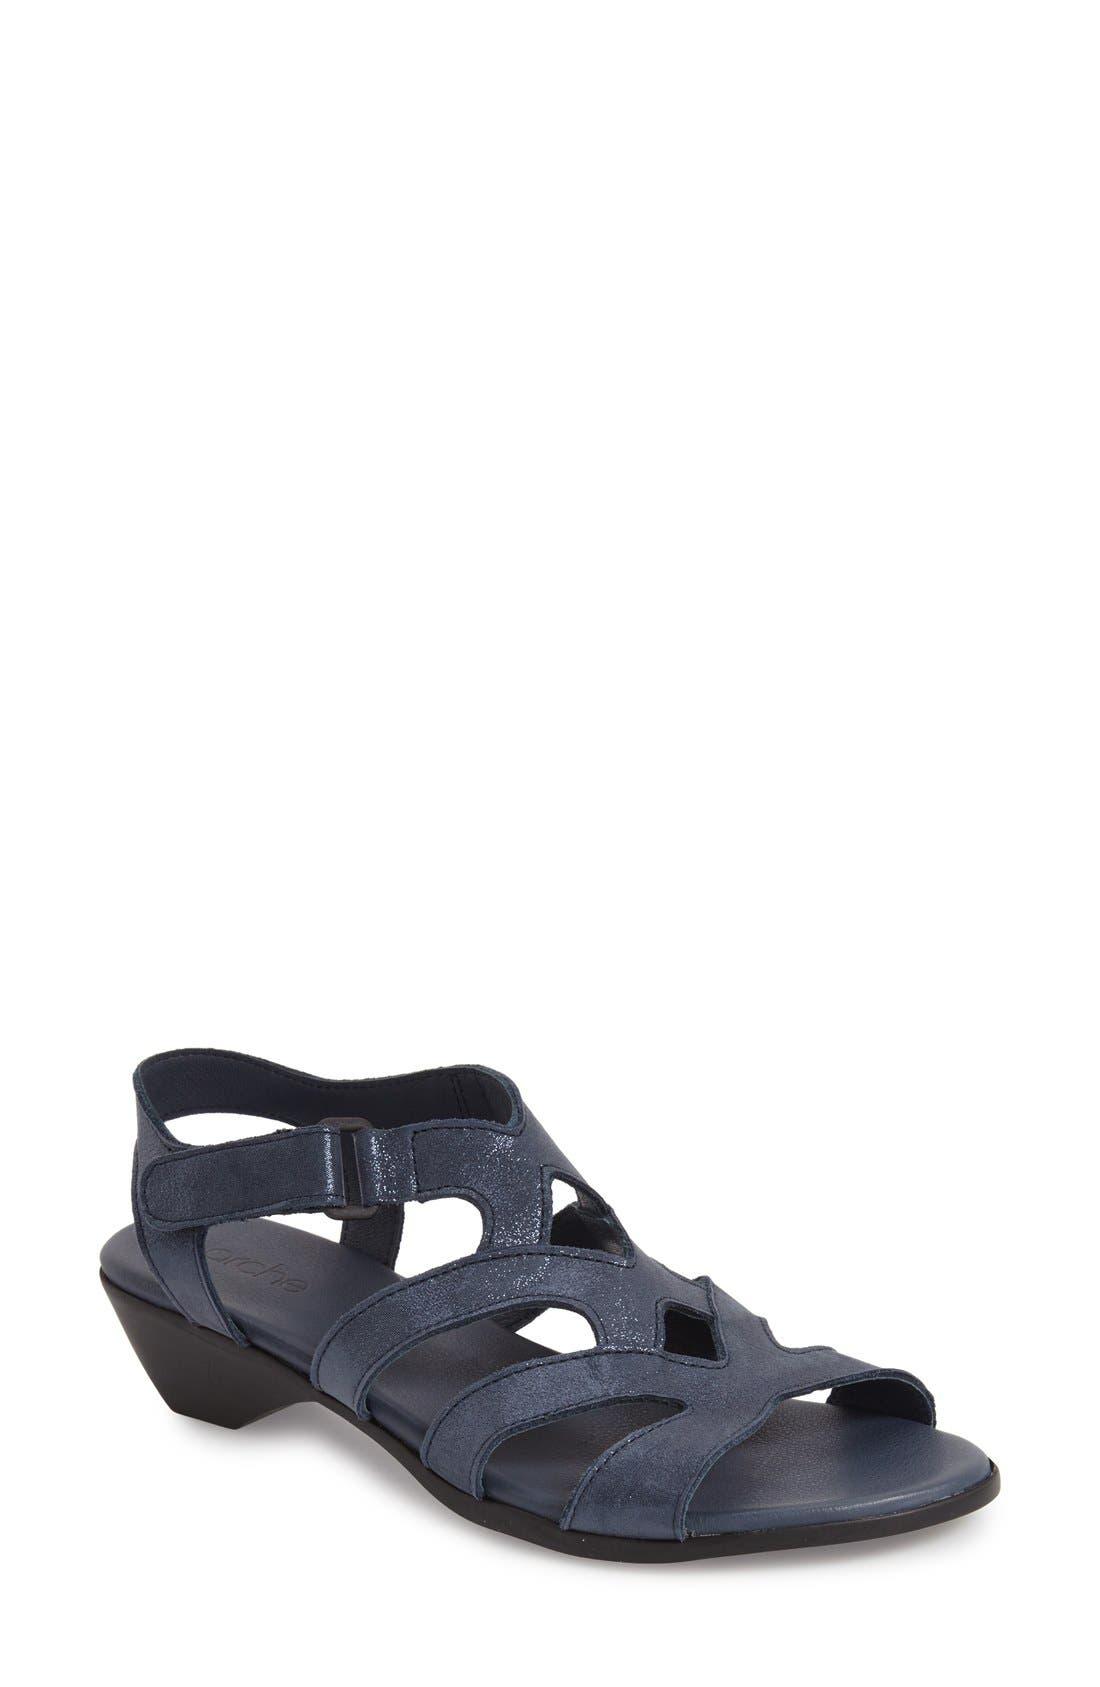 'Obela' Water Resistant Leather Sandal,                             Main thumbnail 5, color,